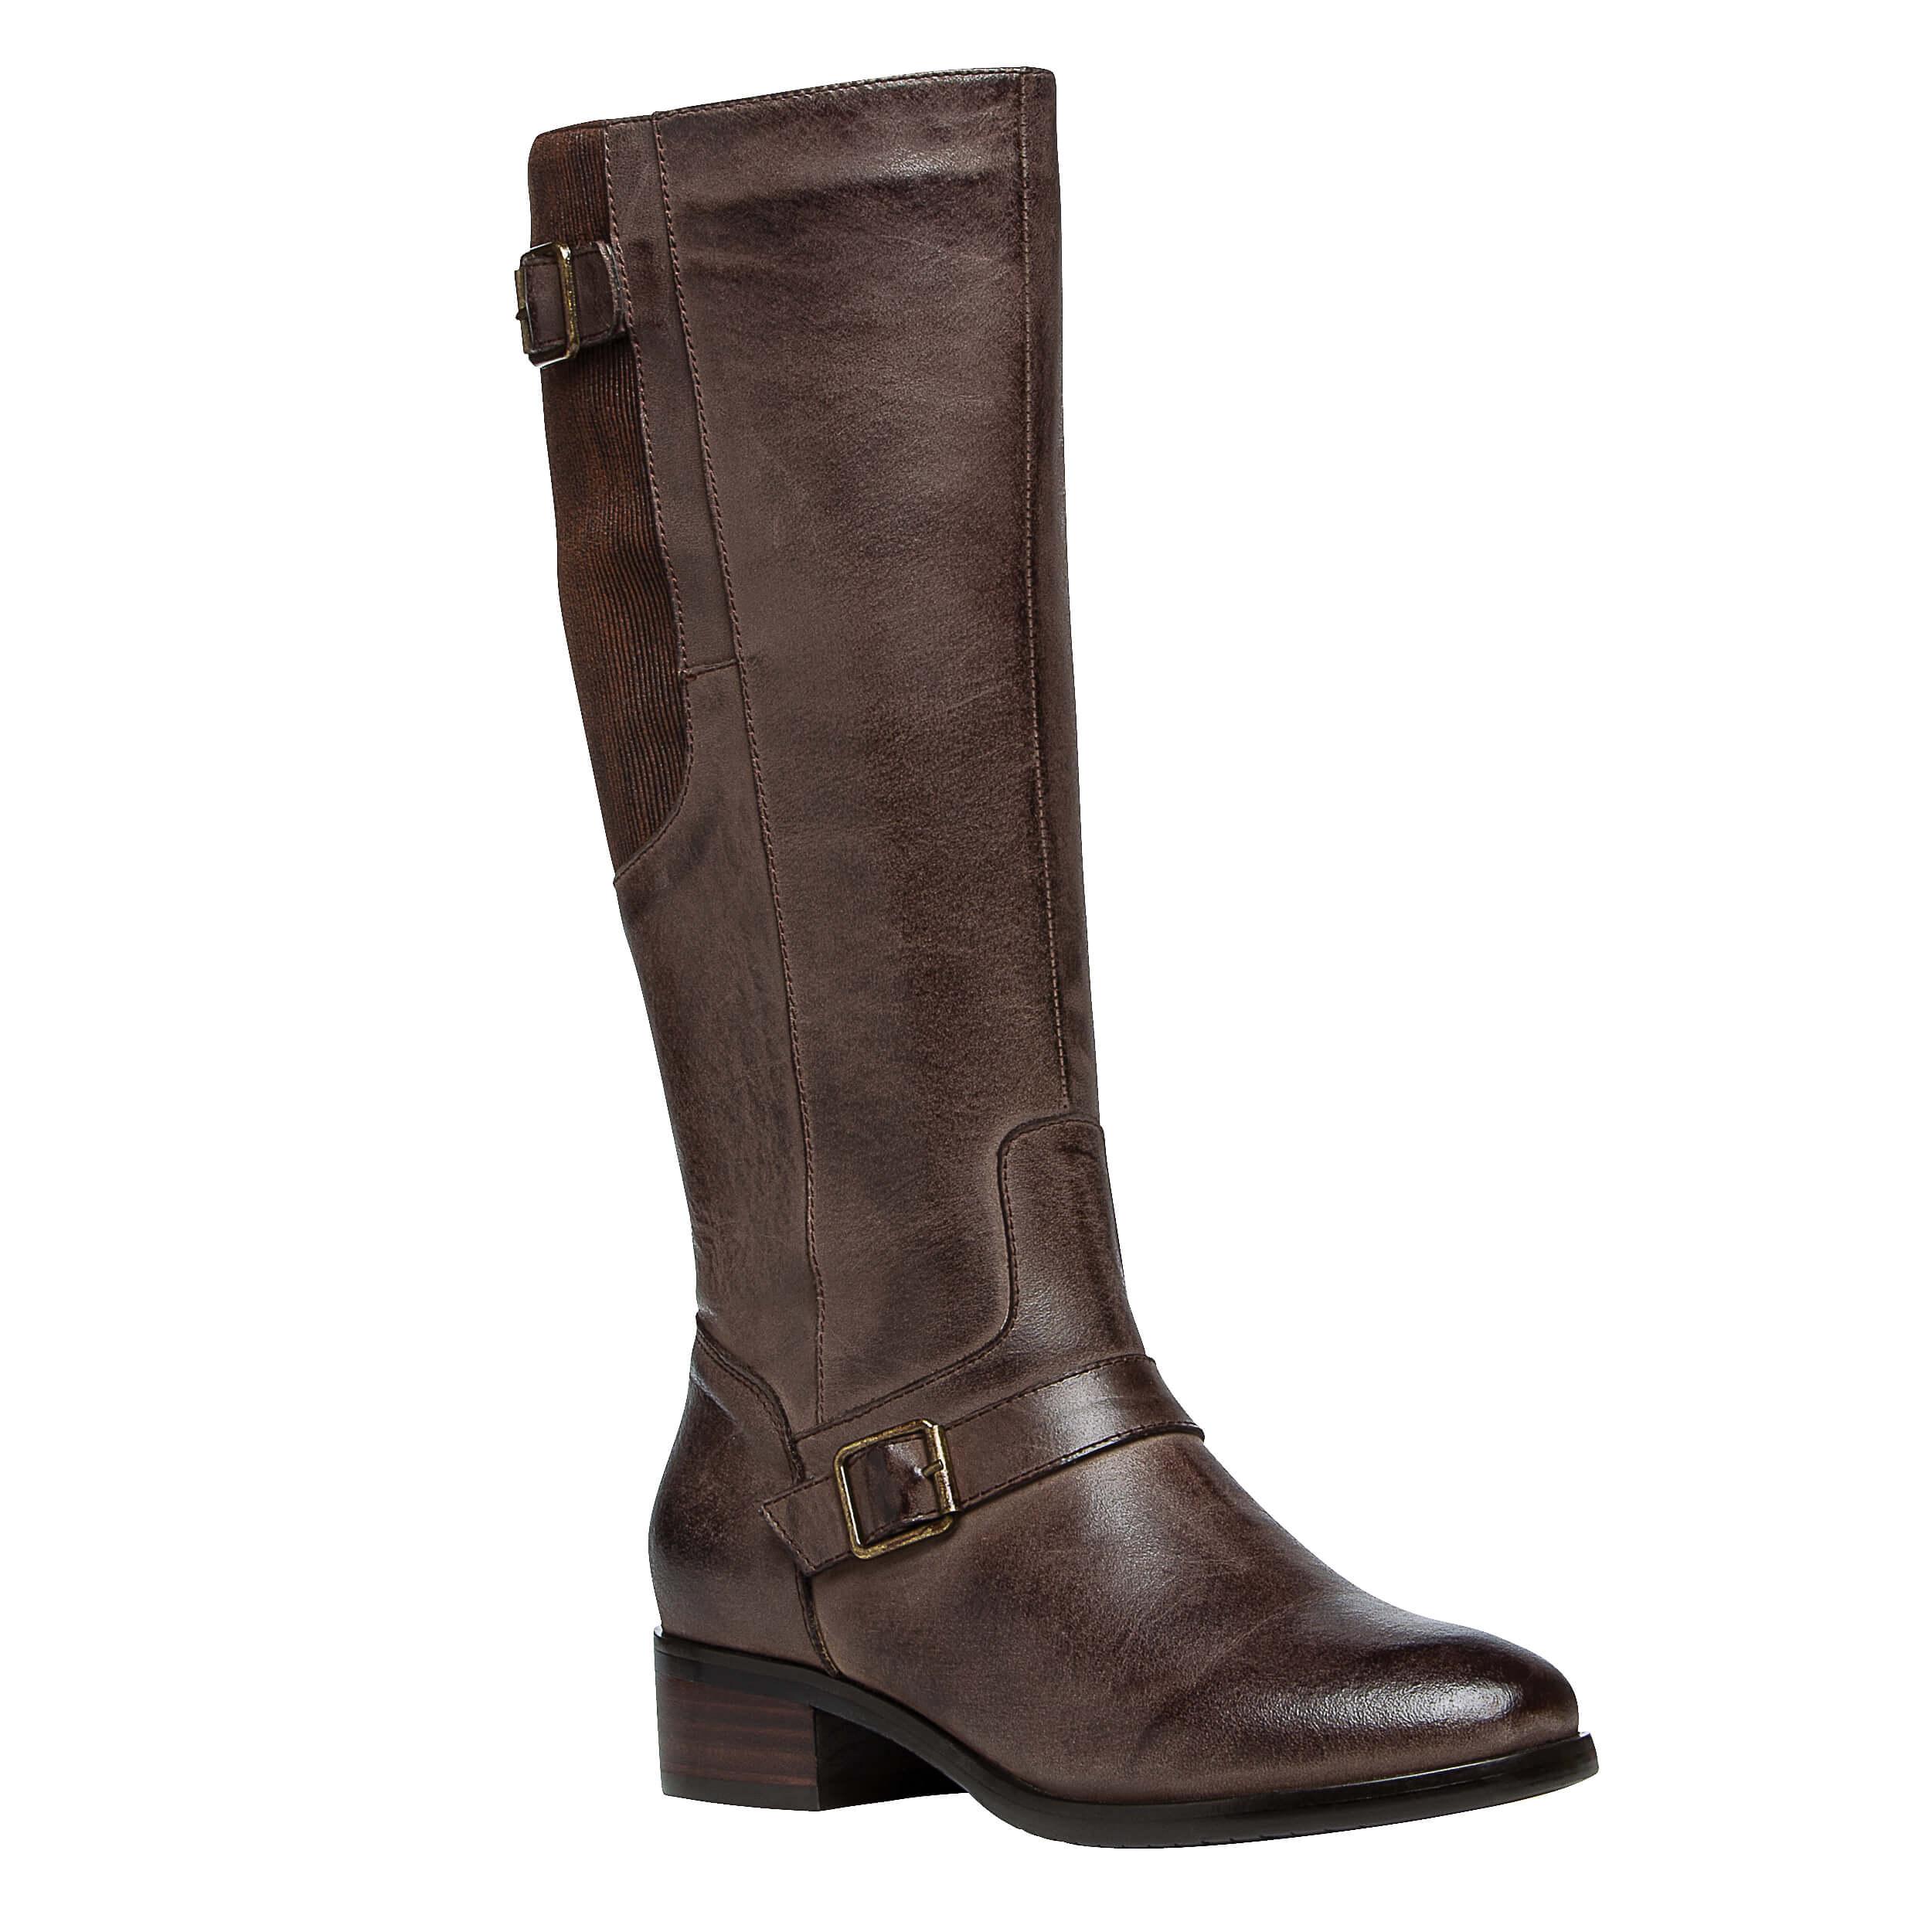 0ad38391951 Propét Teagan - Women's Knee-High Comfort Boot - Flow Feet Orthopedic Shoes